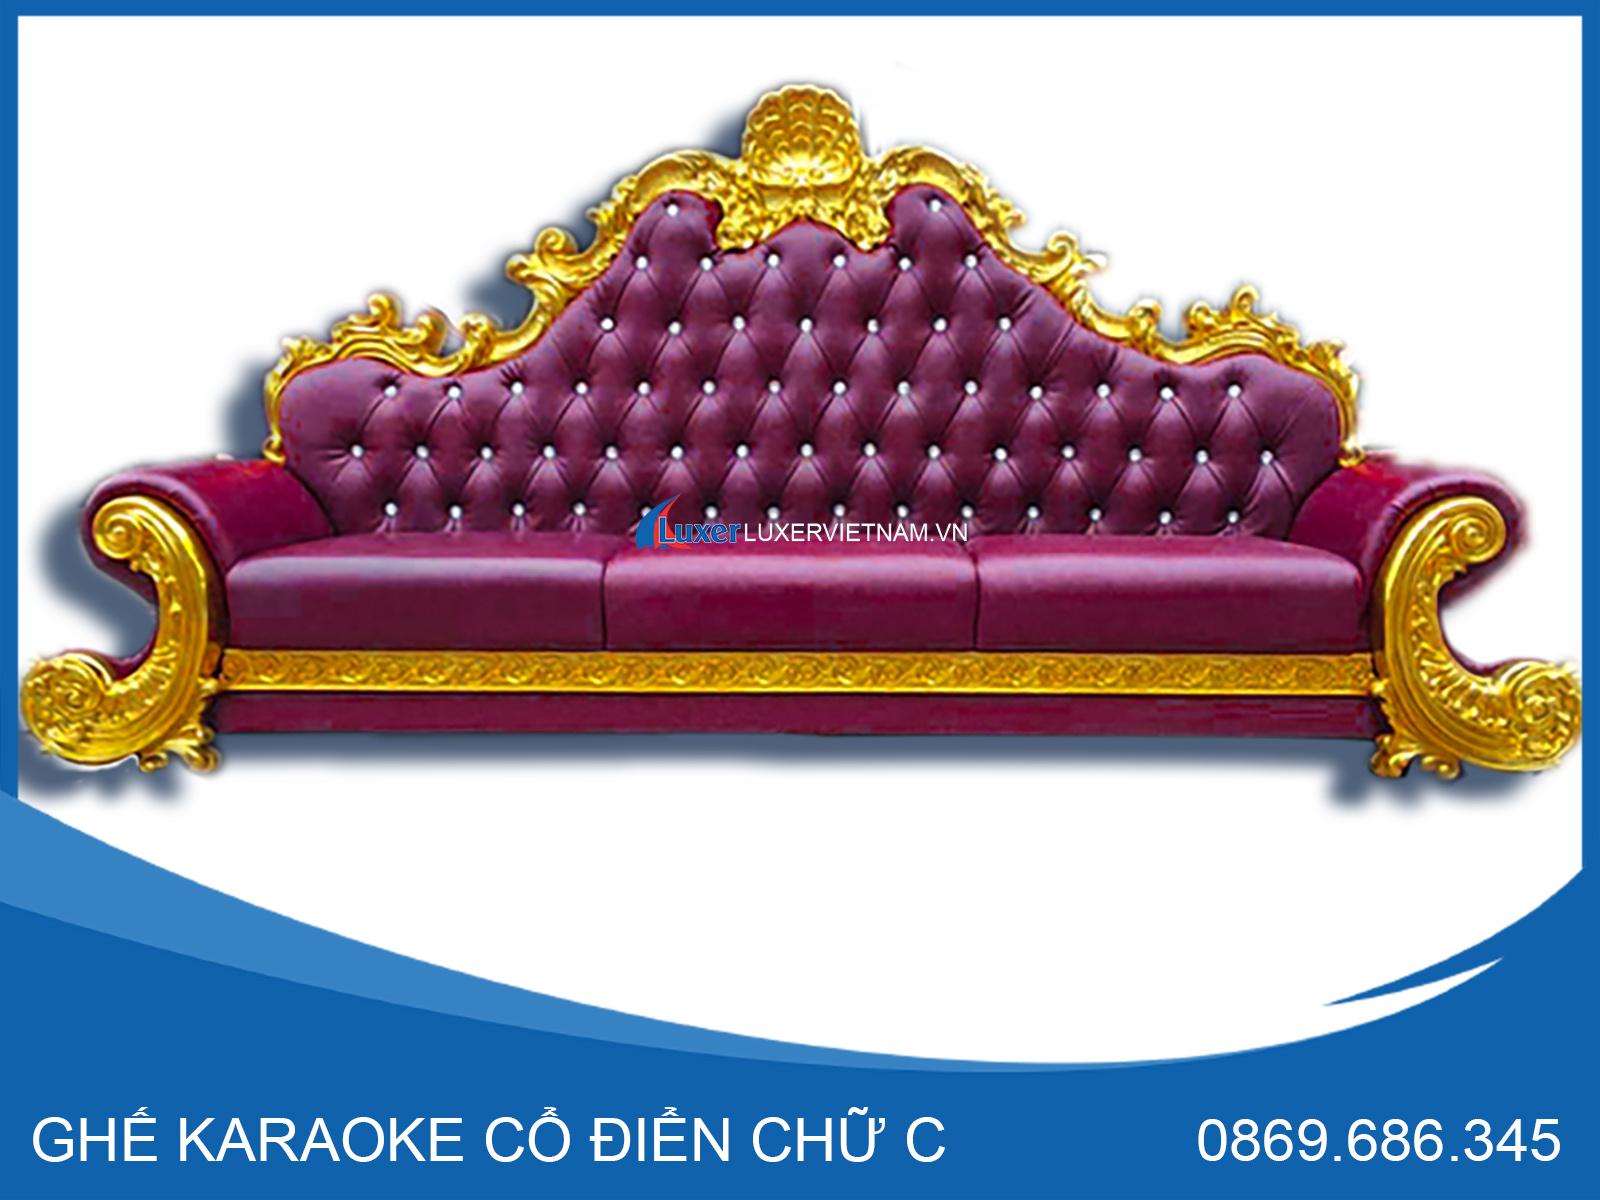 Ghế karaoke cổ điển chữ C Luxer